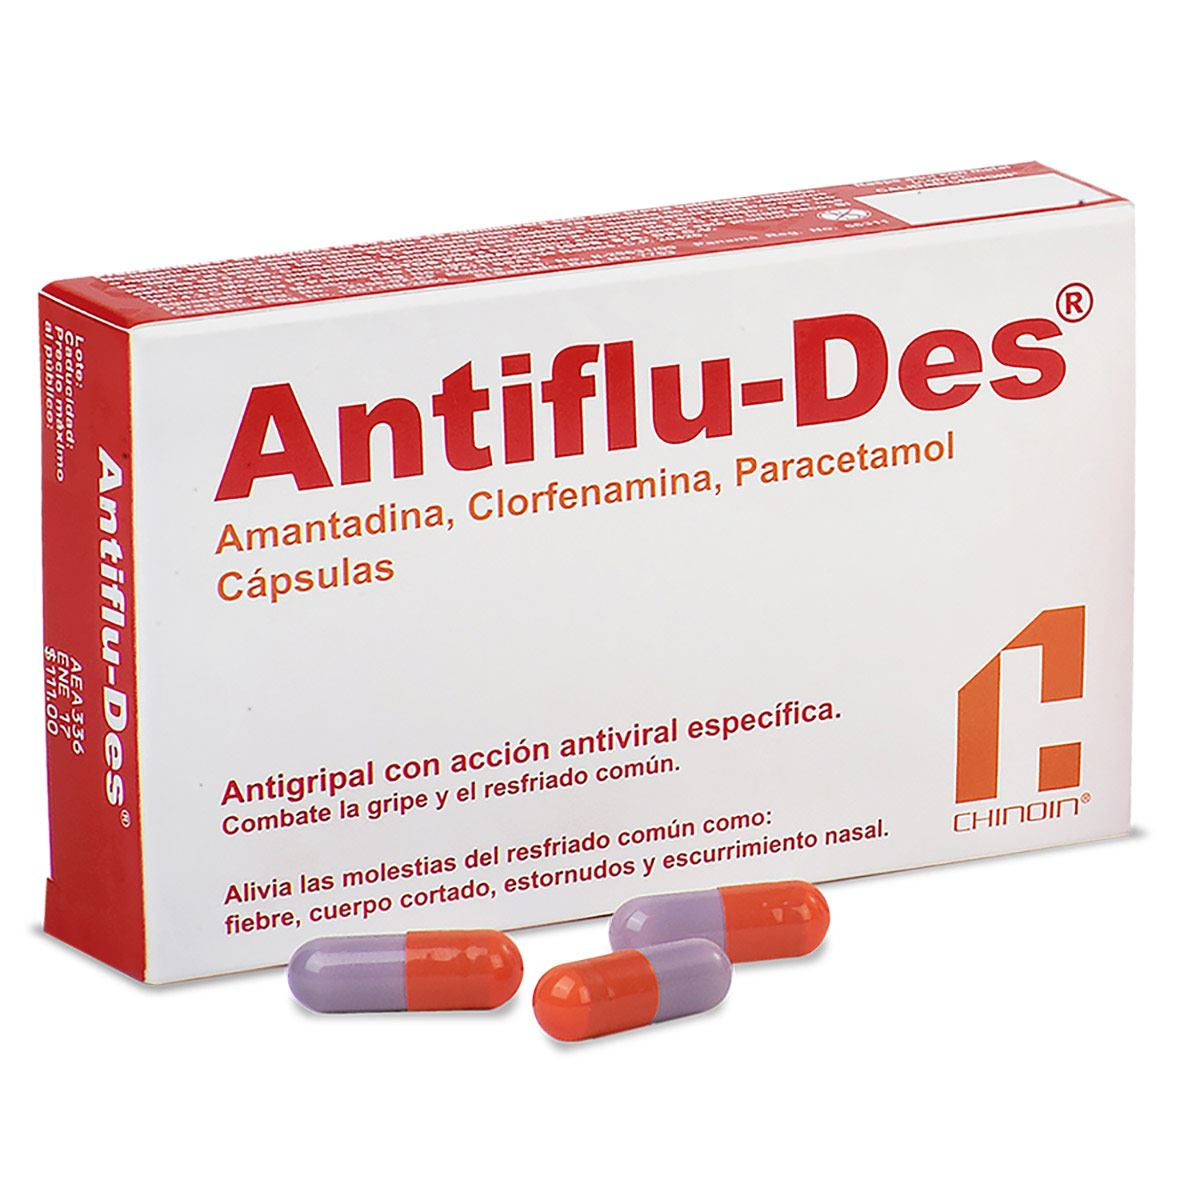 Antiflu-des  - Sanborns